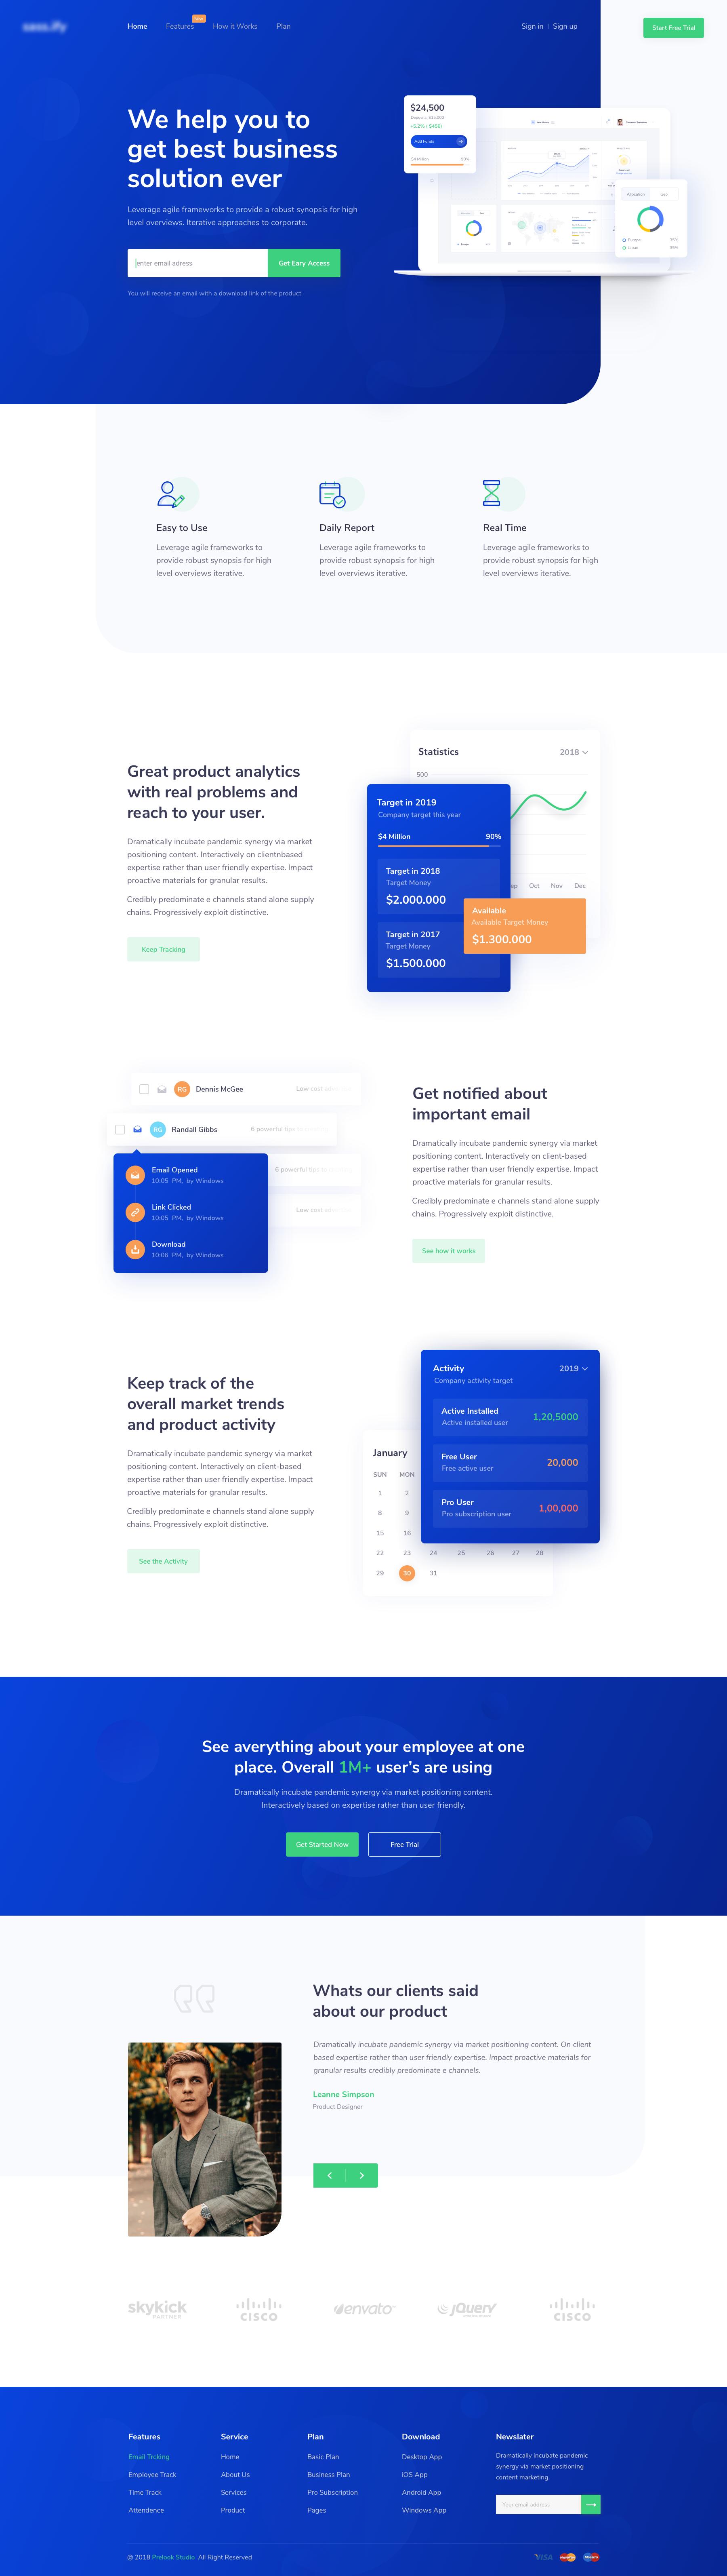 Saas Landing Page Copy 3 Landing Page Web Design Trends Web Design